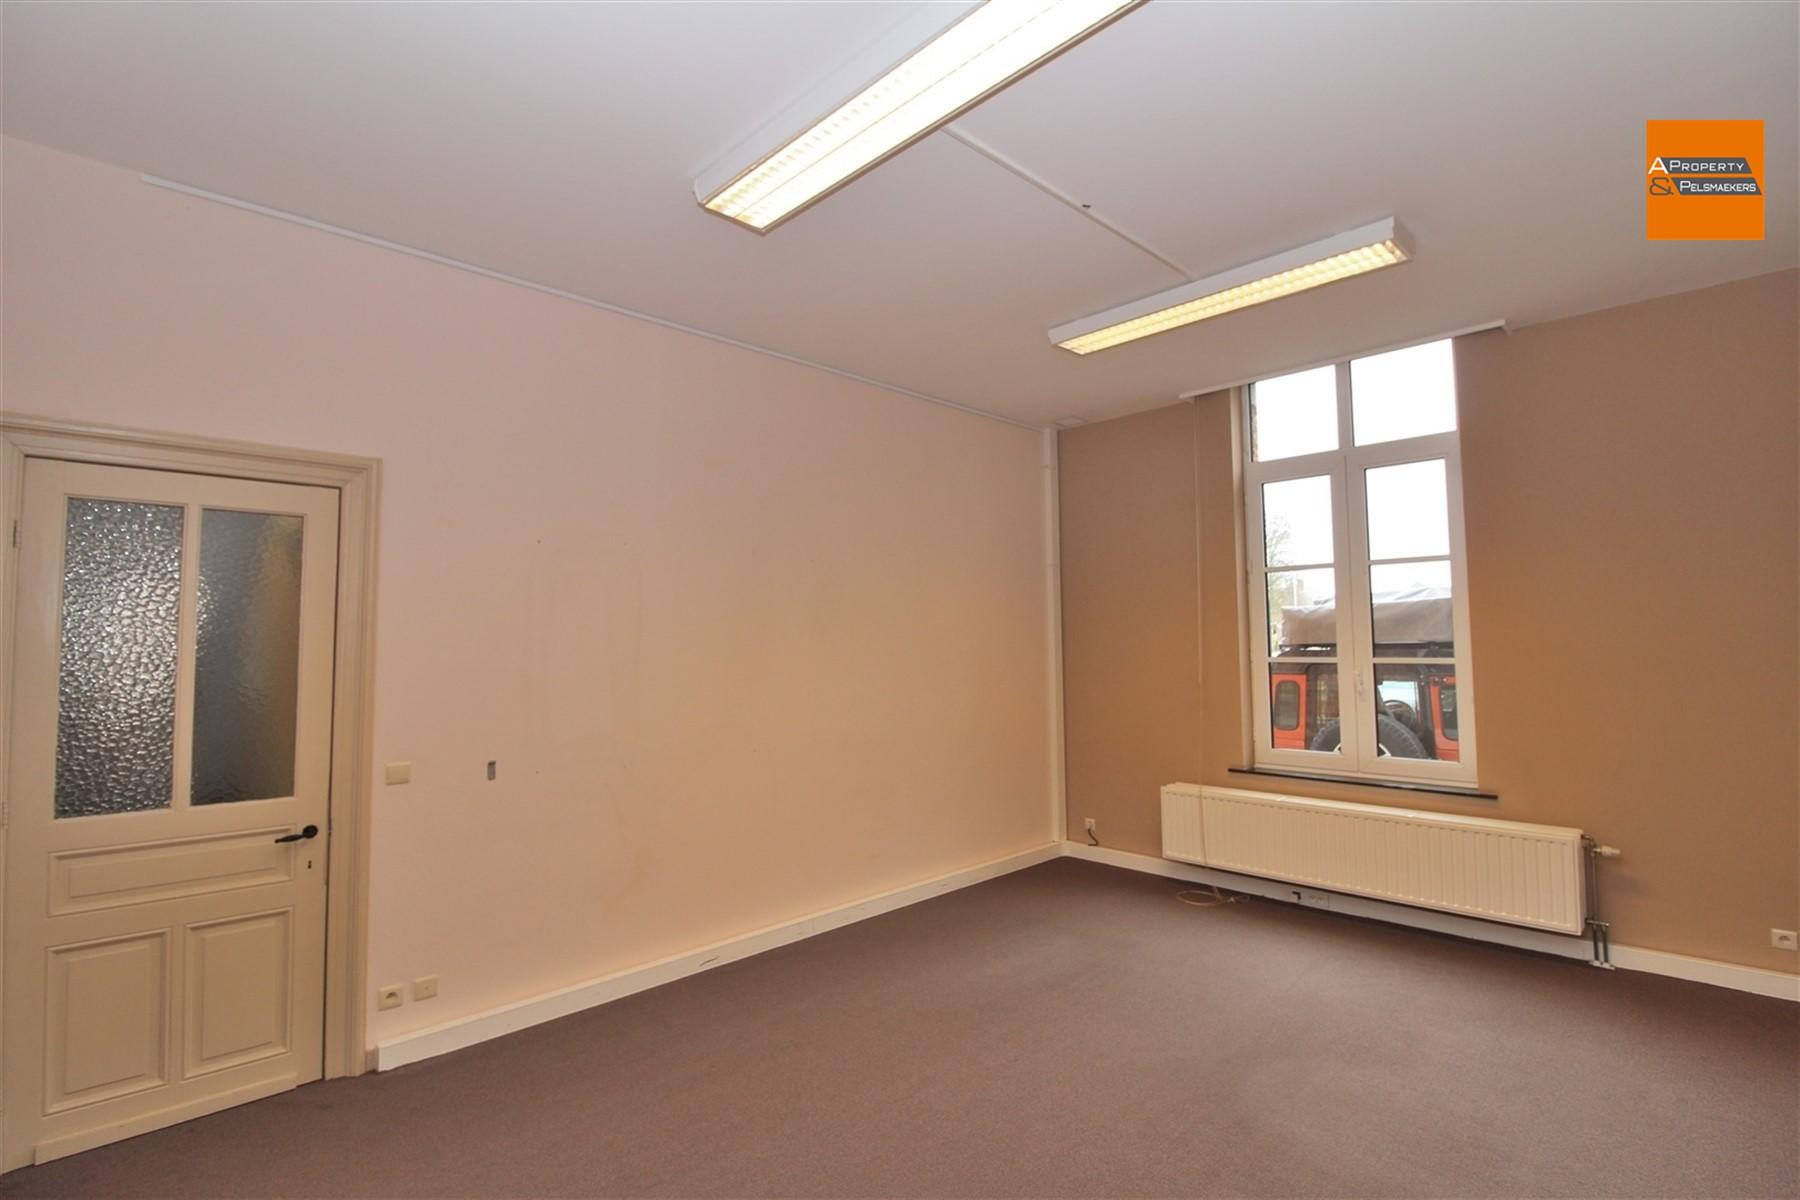 Foto 9 : Huis in  KAMPENHOUT (België) - Prijs € 950